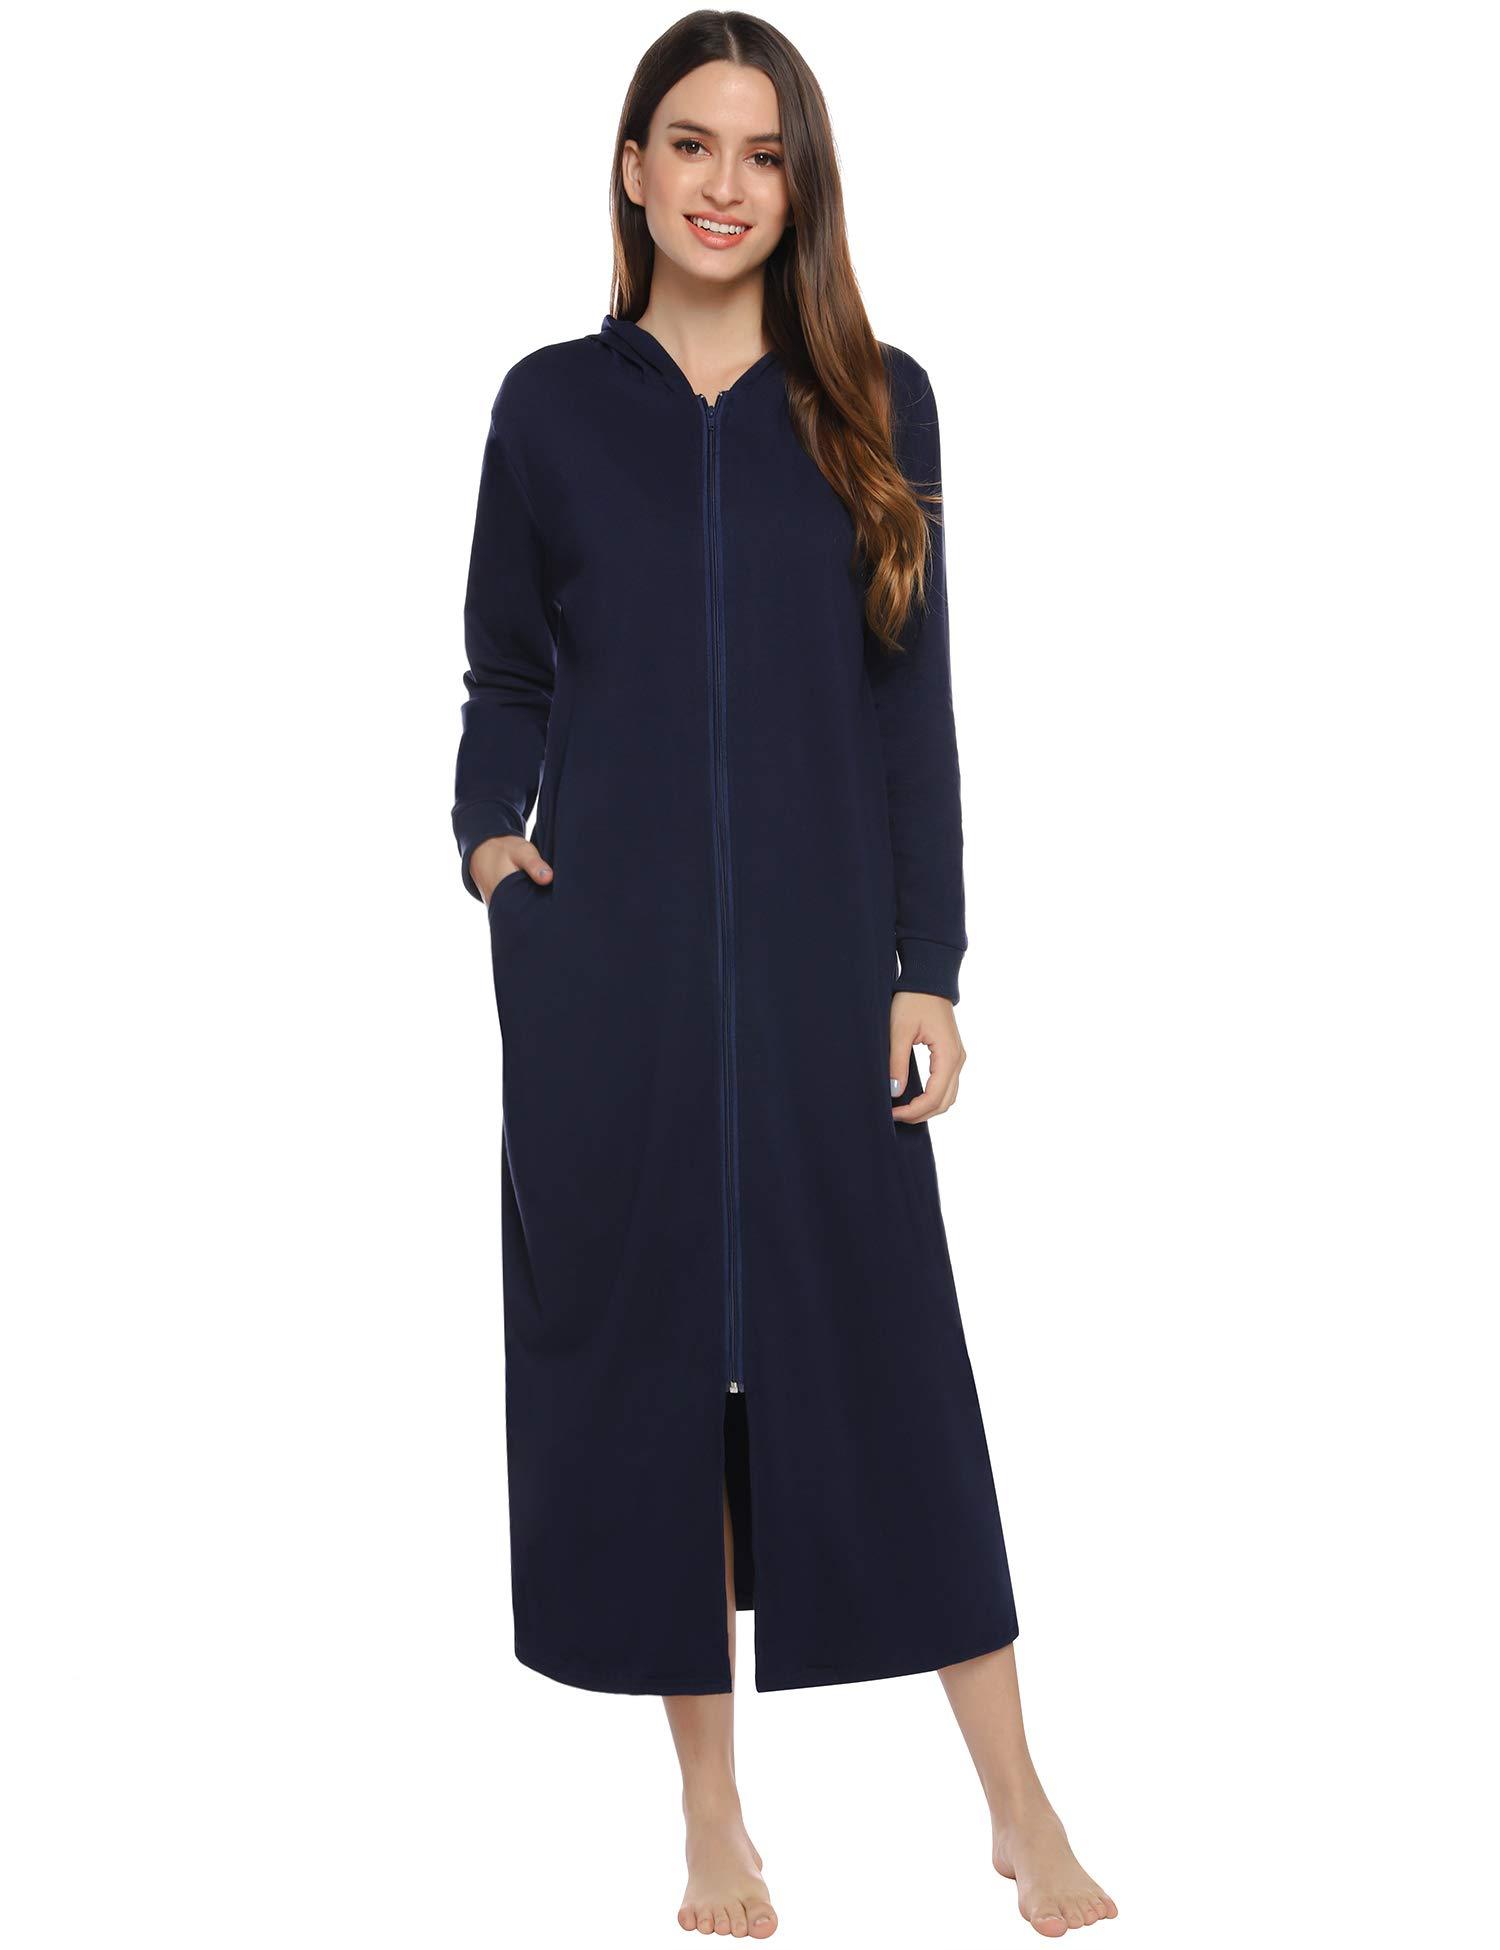 iClosam Womens Hooded Zipper Bathrobe Spring-Fall Robes with Pockets Housecoat Nightgown Sleepwear Loungewear S-XXL